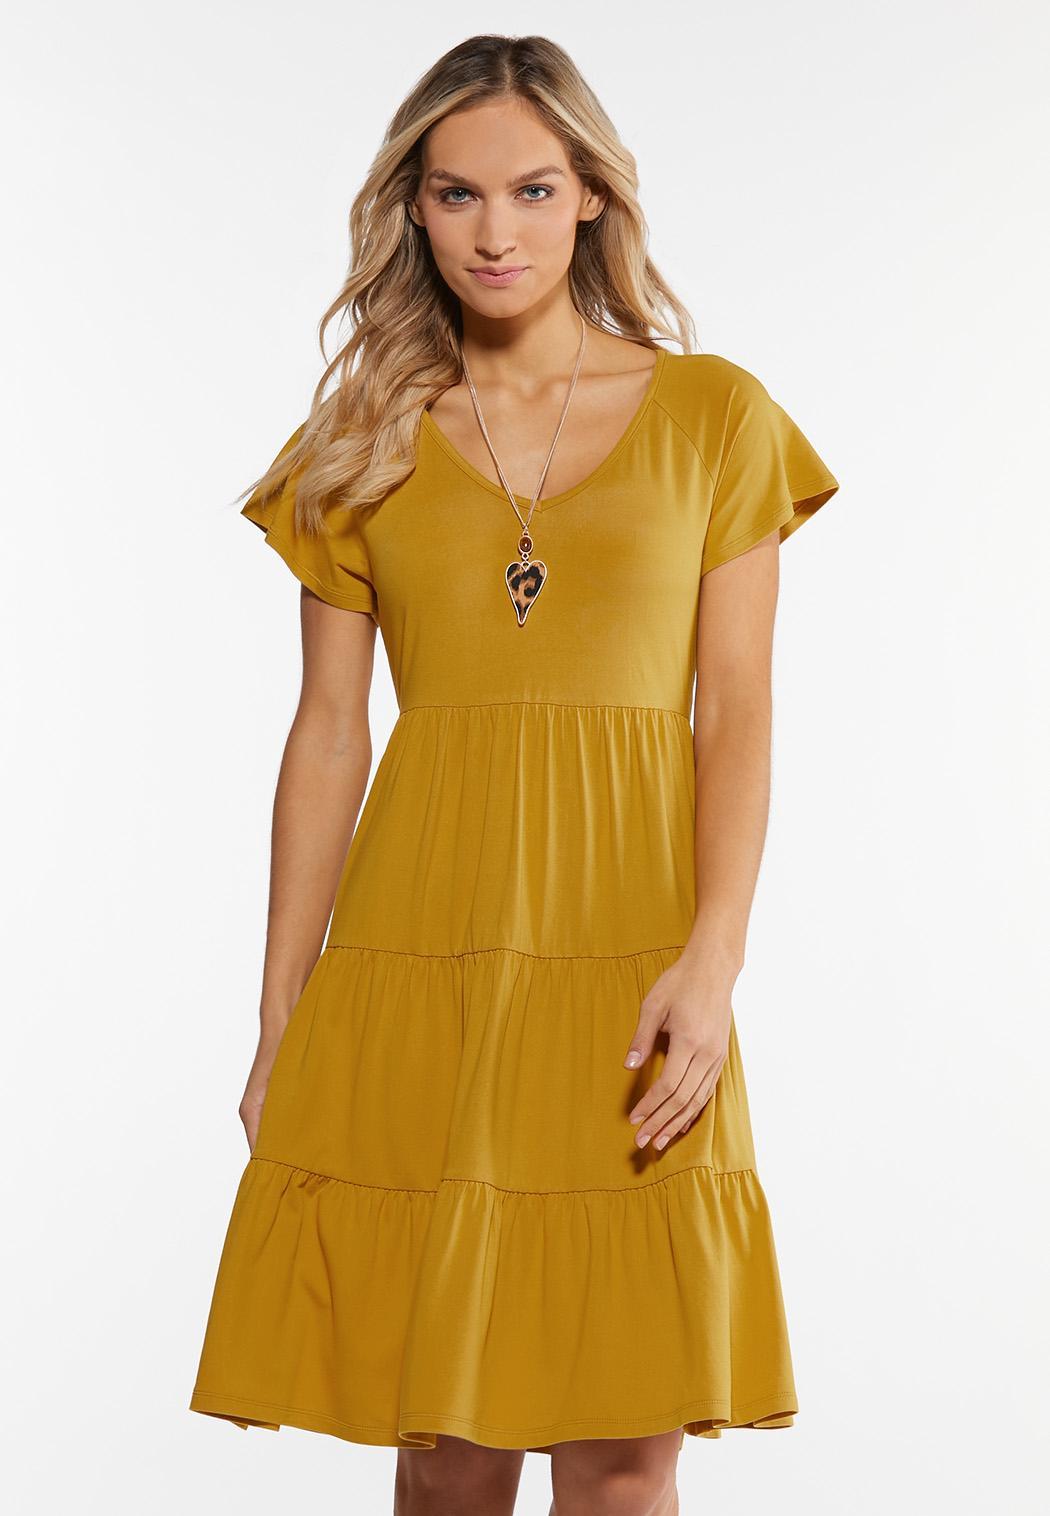 Tiers And Sunshine Dress